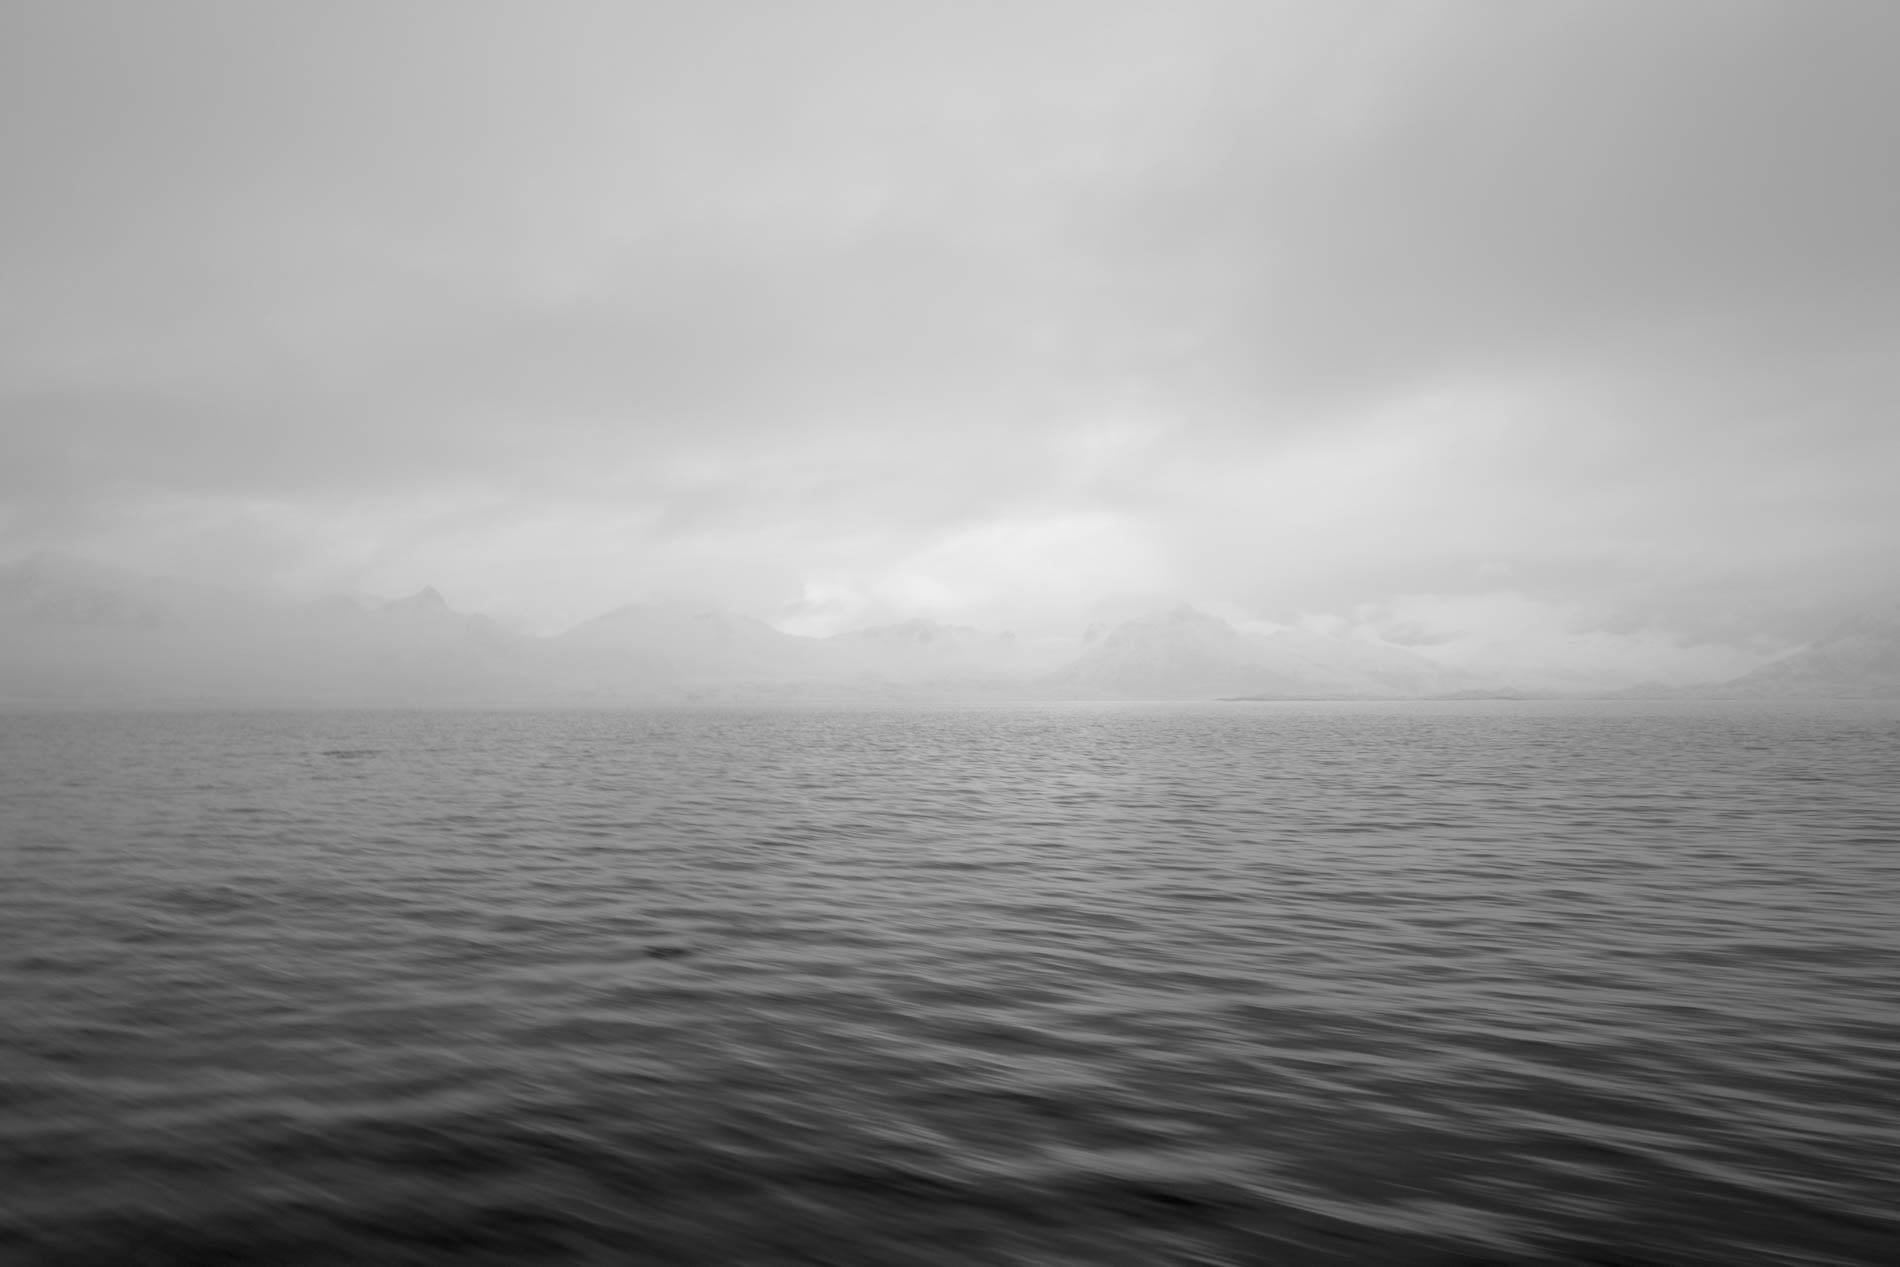 lofoten-8269.jpg